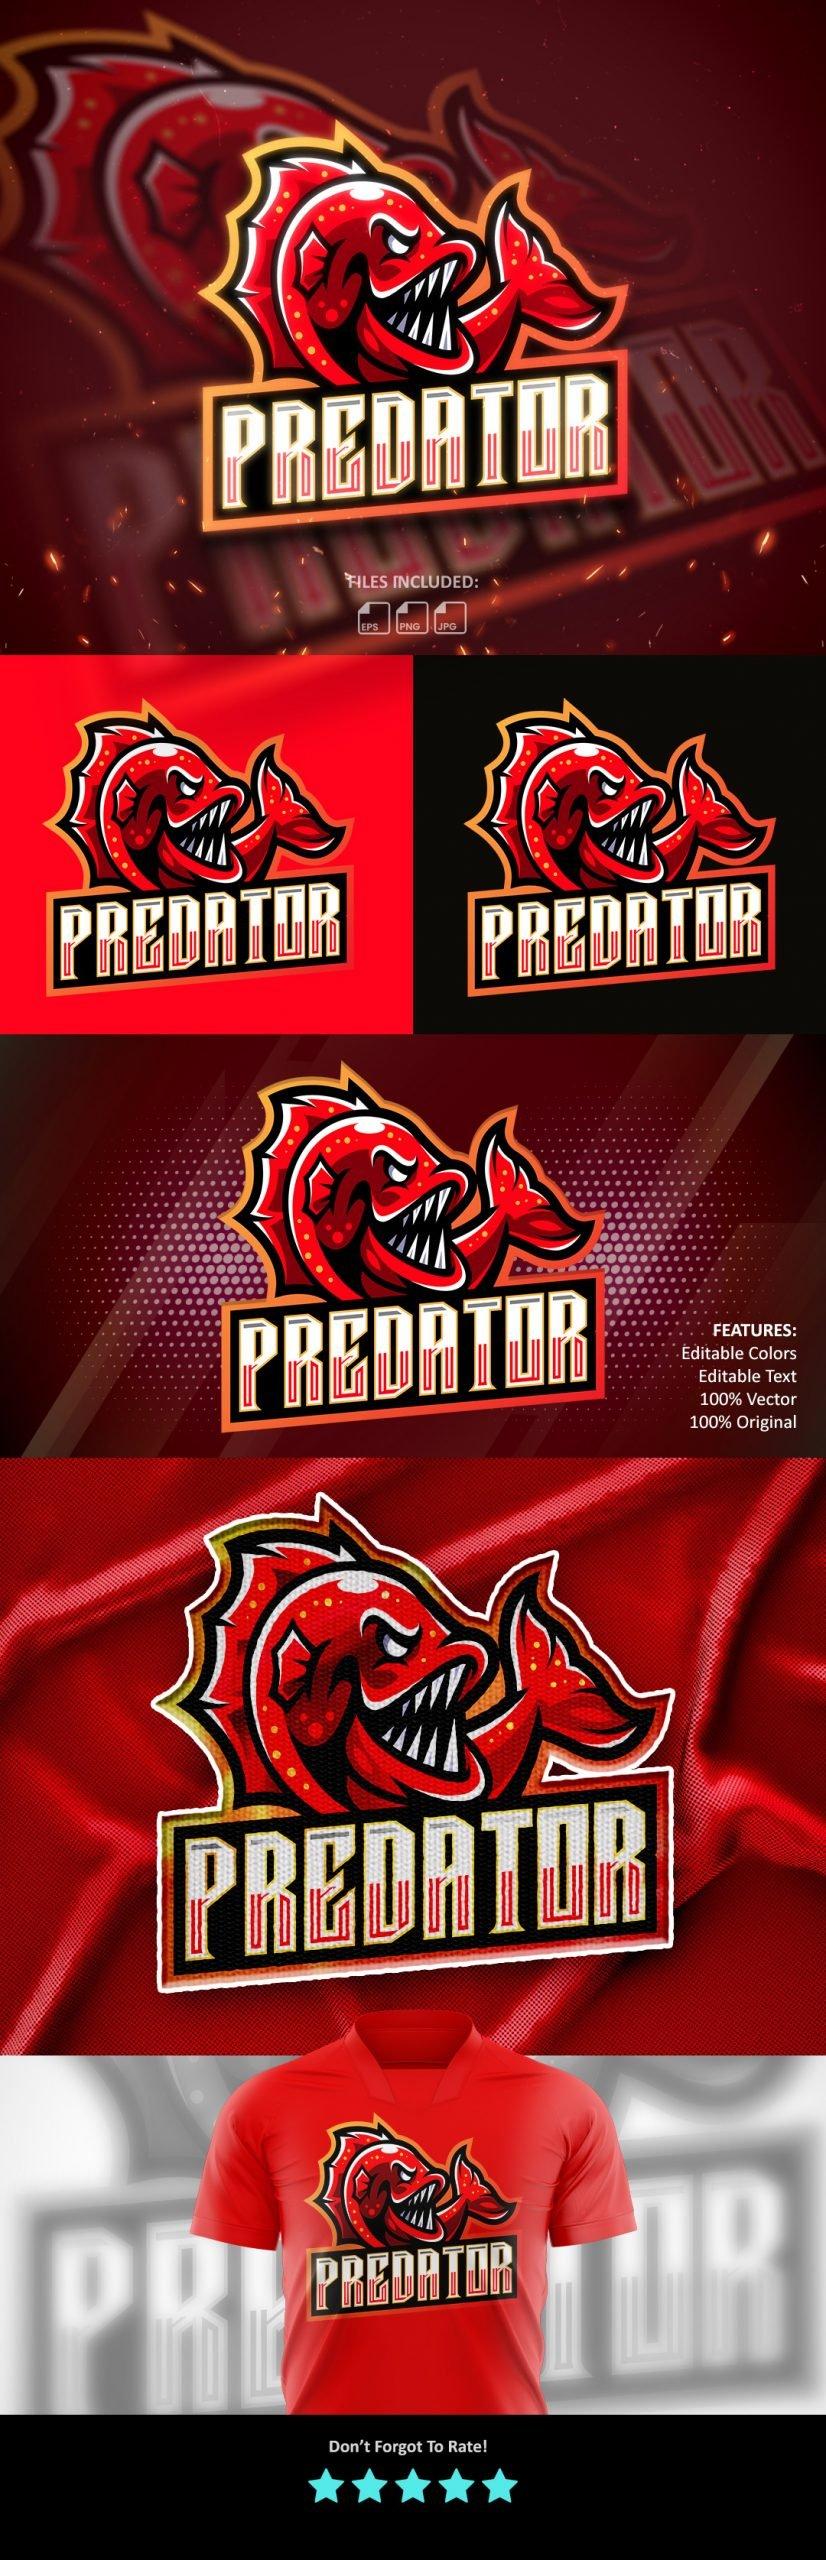 Predator Mascot Logo Template